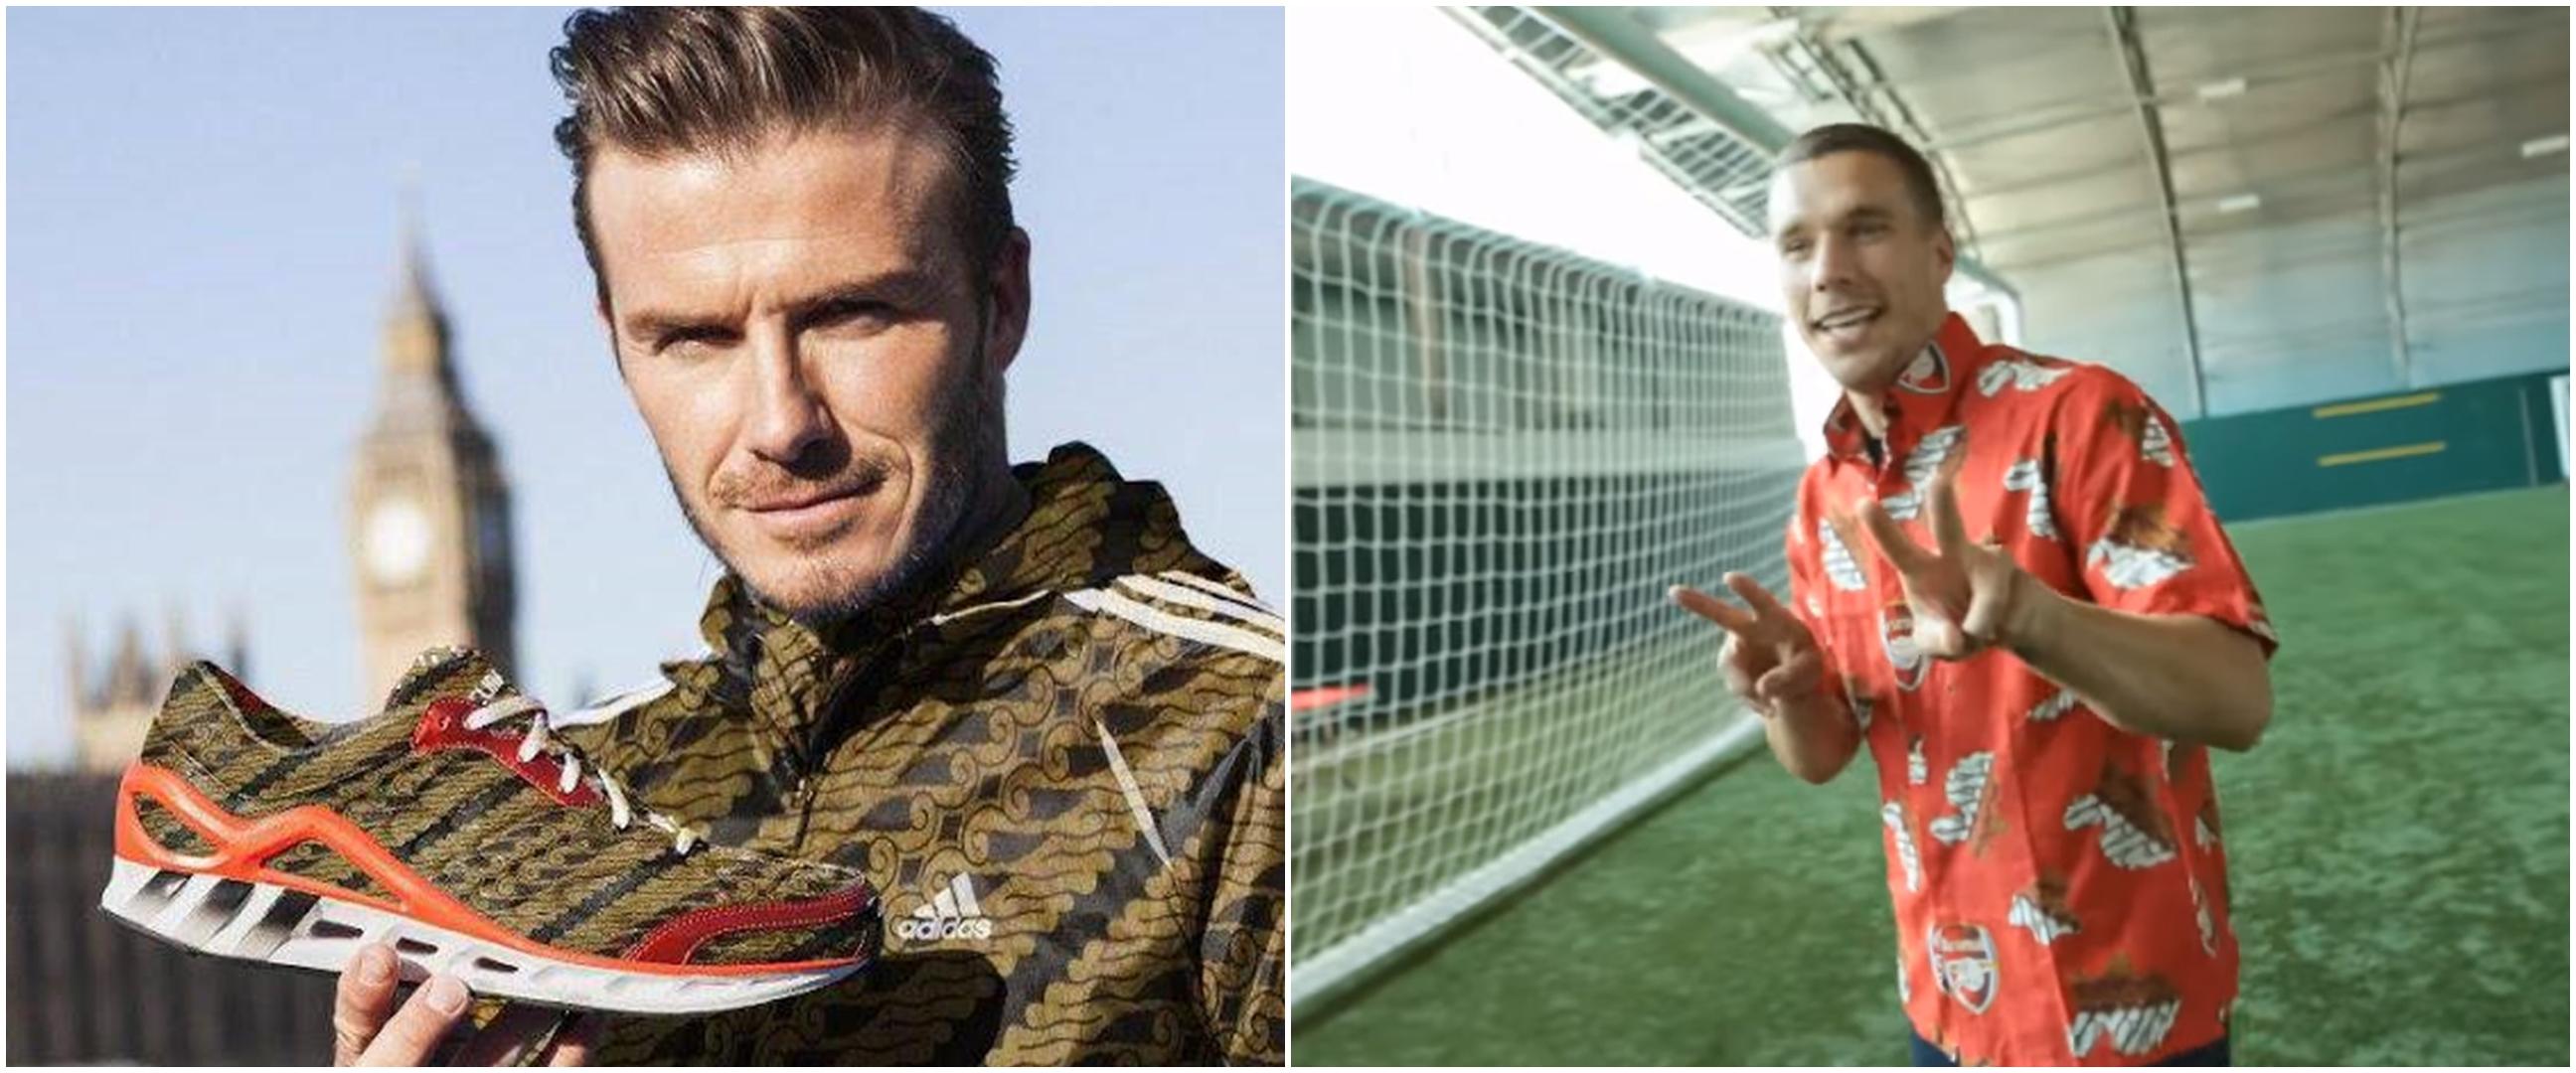 Potret 6 pesepak bola top pakai batik, Zidane hingga Beckham